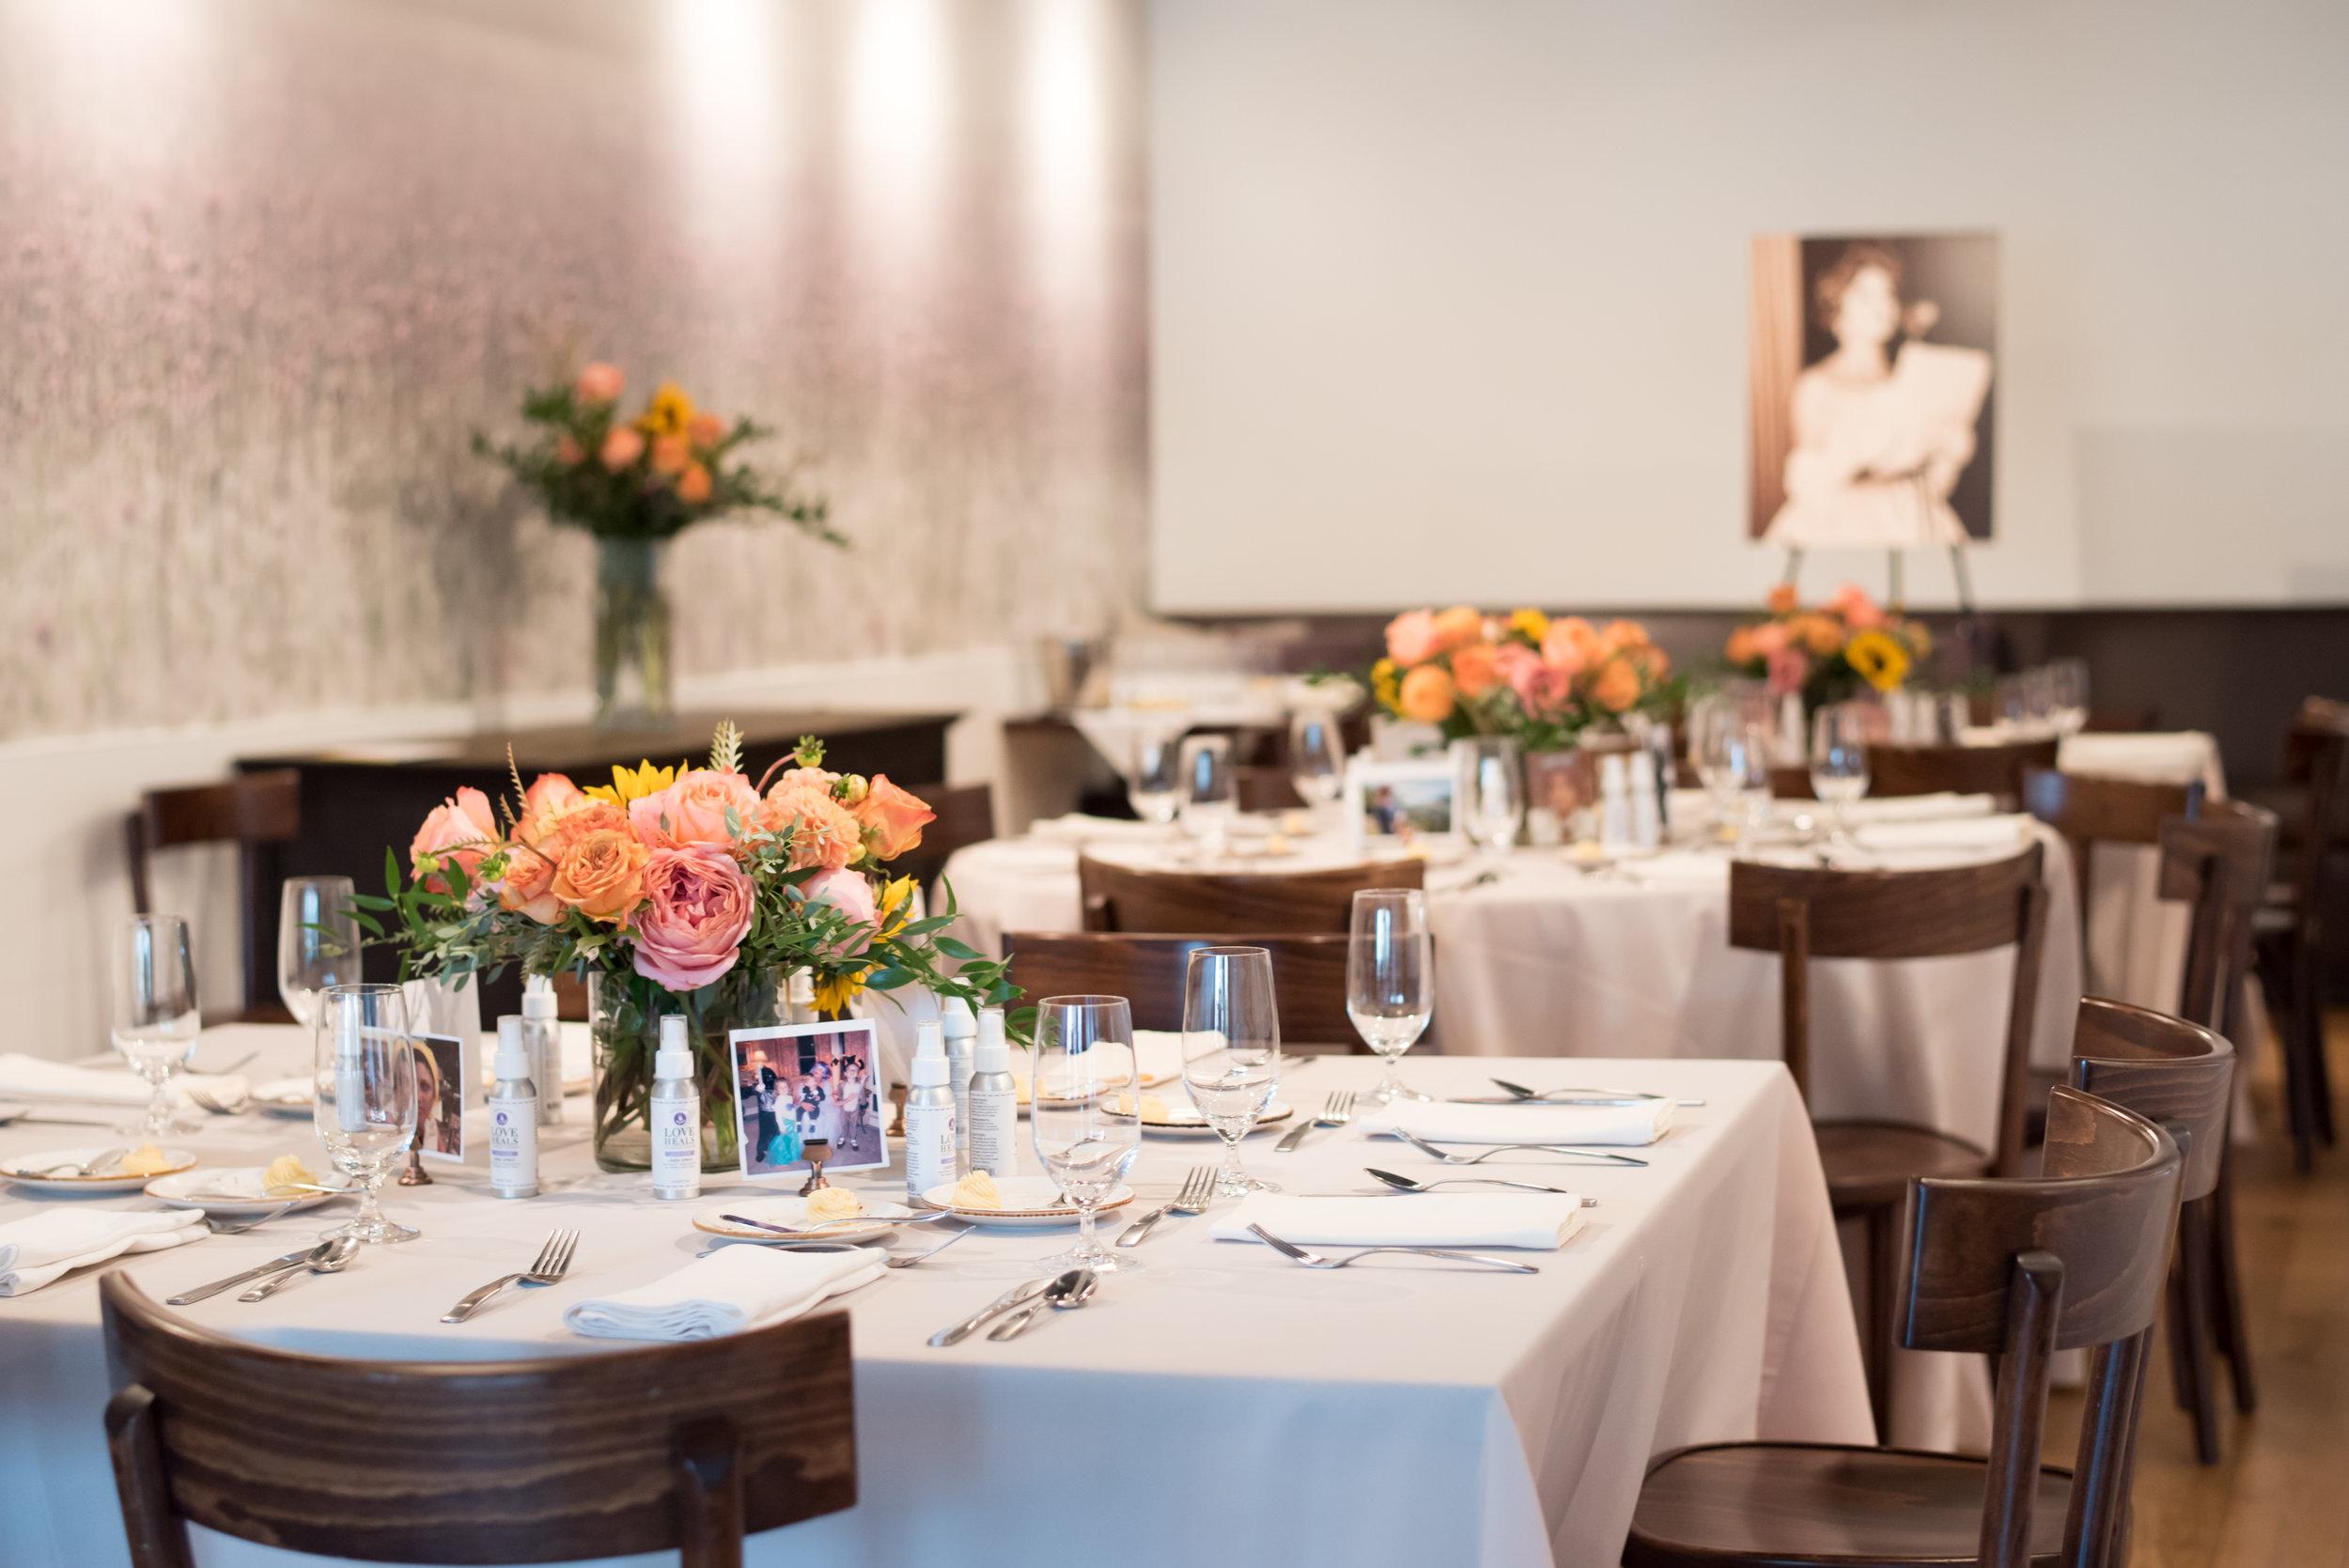 Joanne Cato's Birthday Luncheon_10.10.18-36.jpg